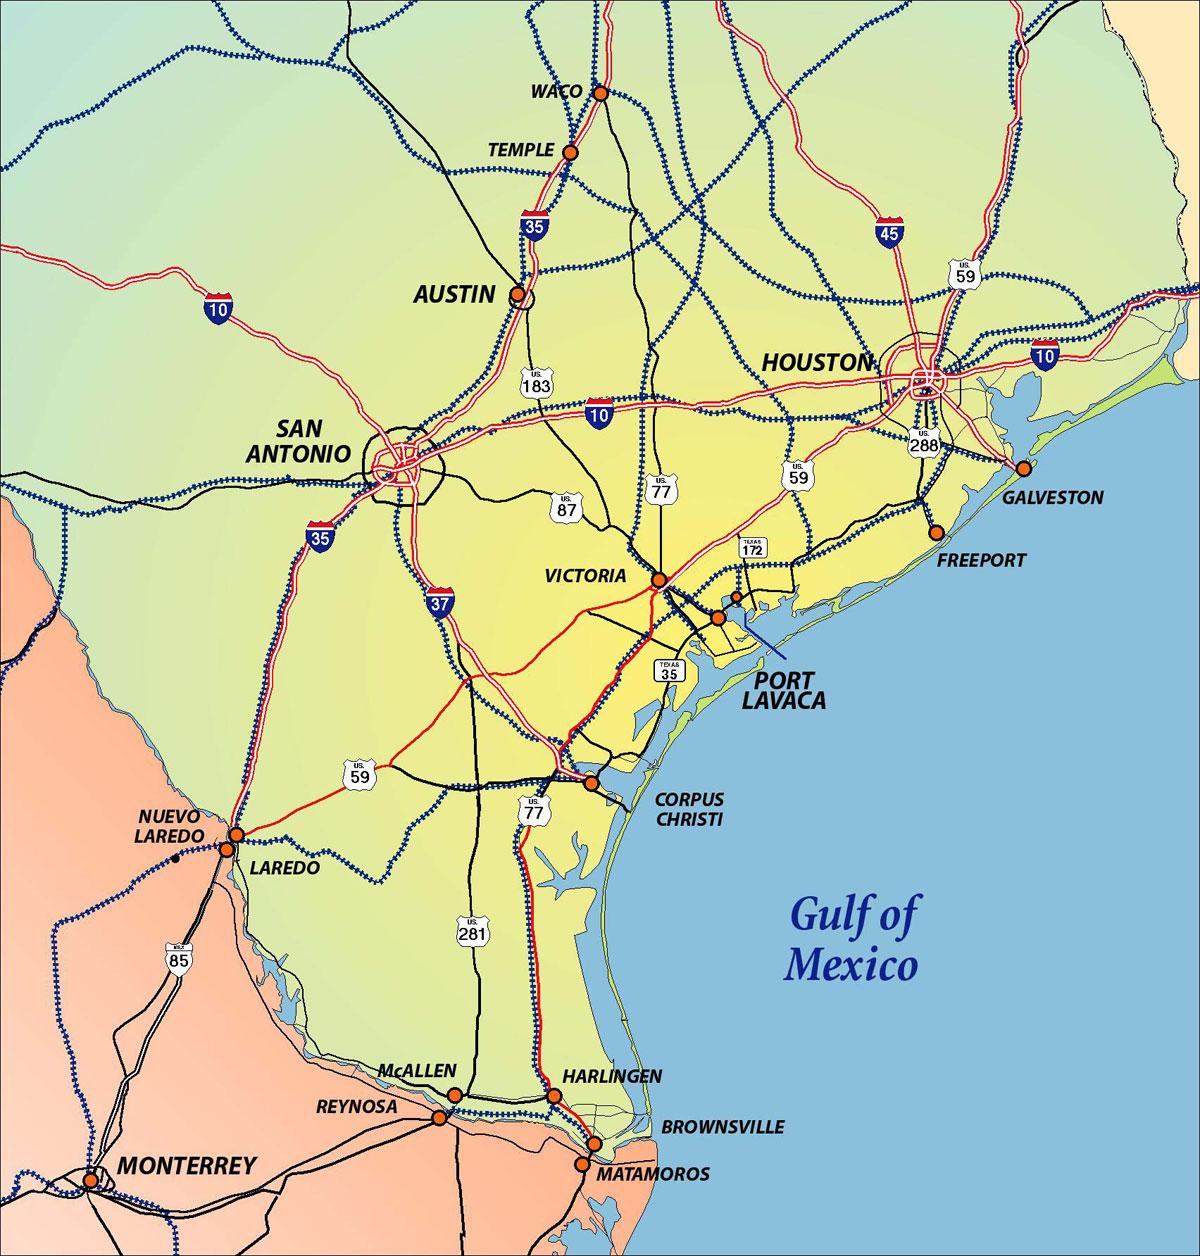 Texas Gulf Coast Maps And Travel Information | Download Free Texas - Texas Gulf Coast Beaches Map